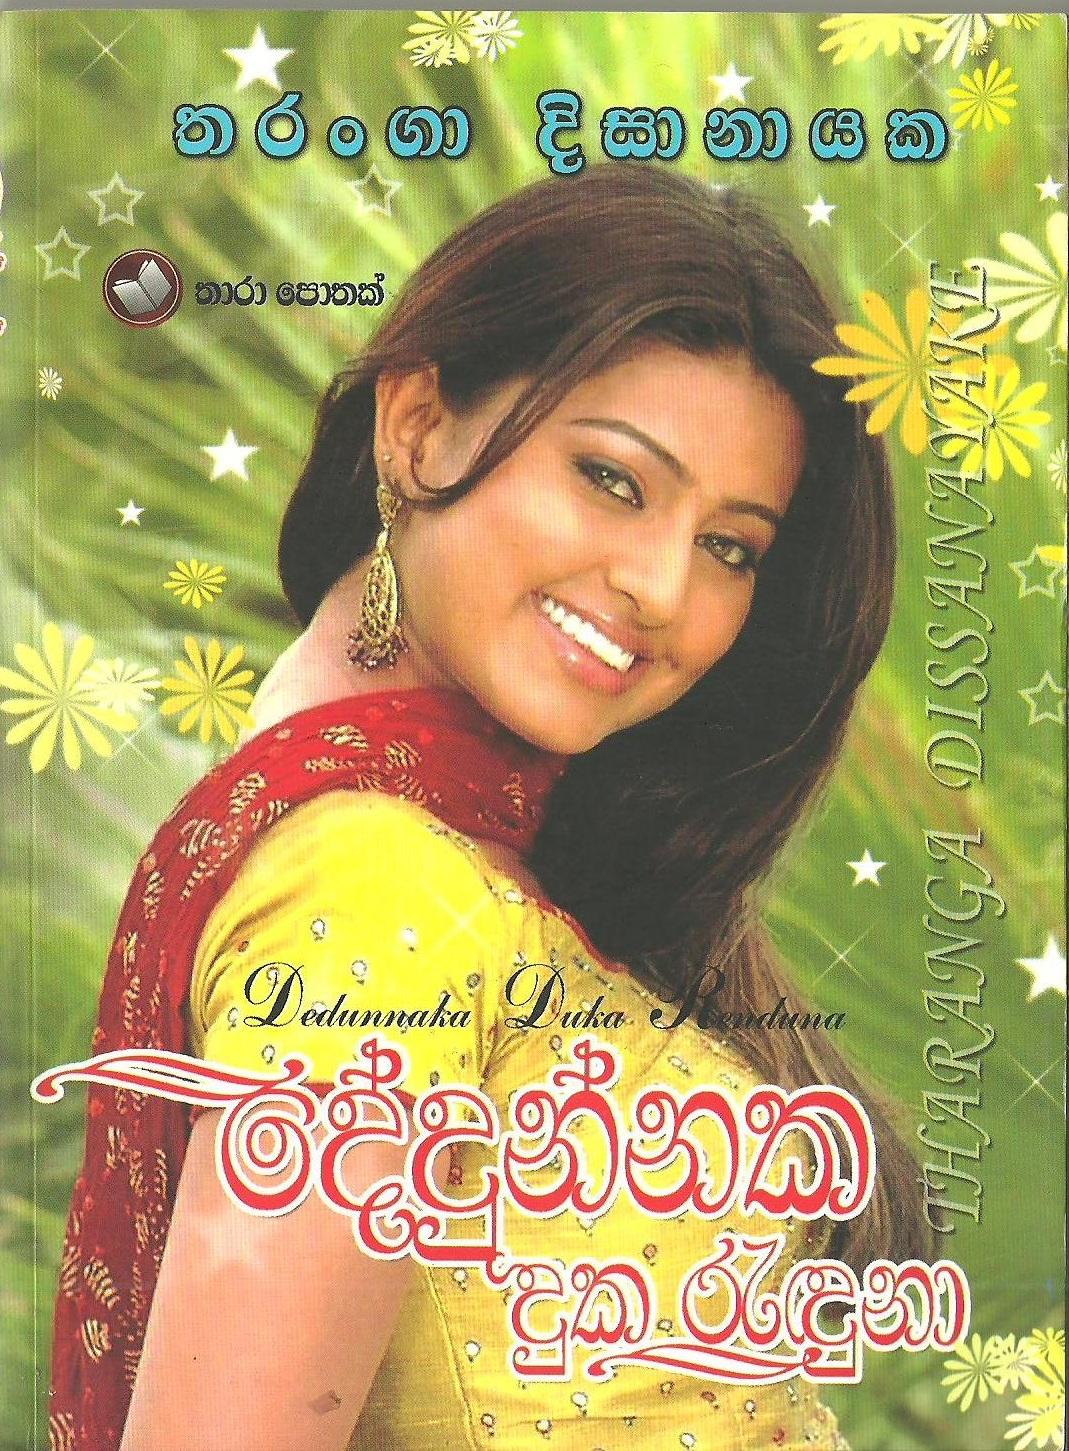 Sinhala Novels Love Story Pdf